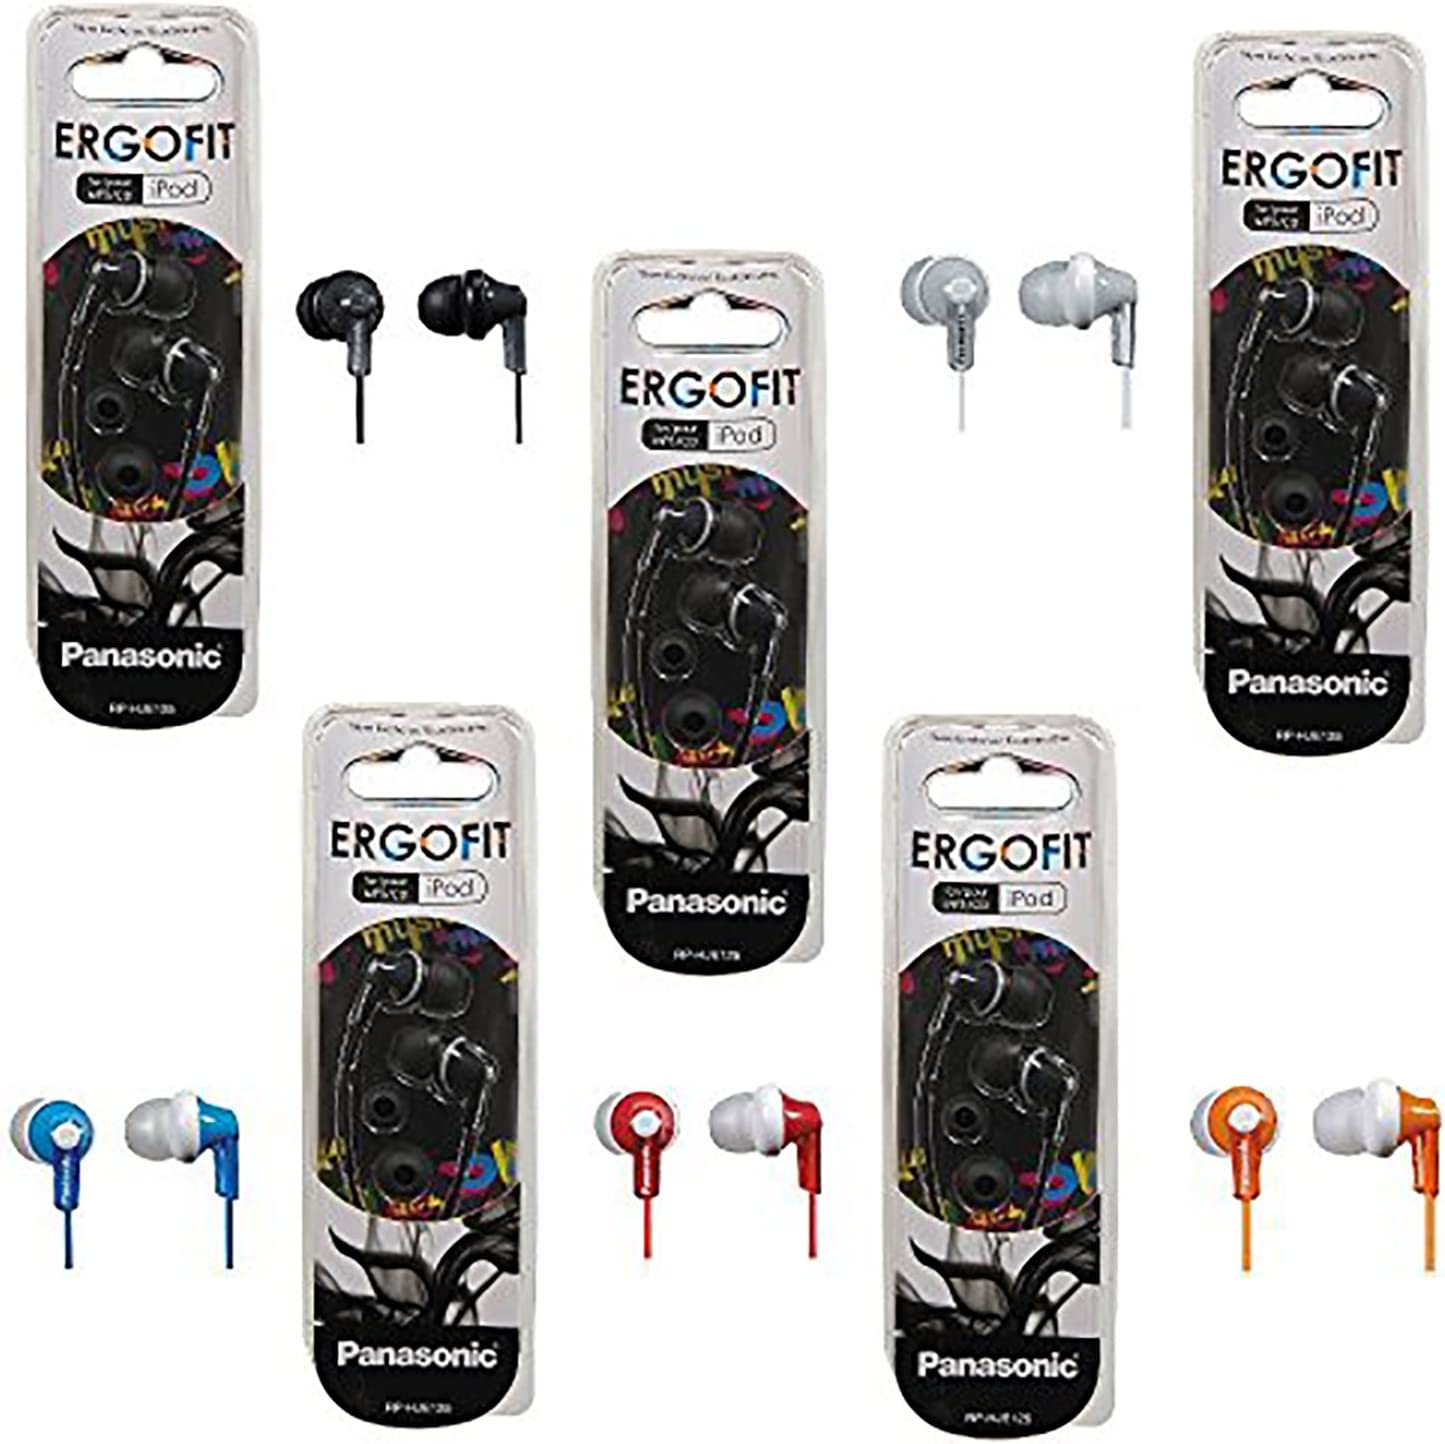 Panasonic ErgoFit In-Ear Earbud Headphones - 5 Pack (Assorted Colors)